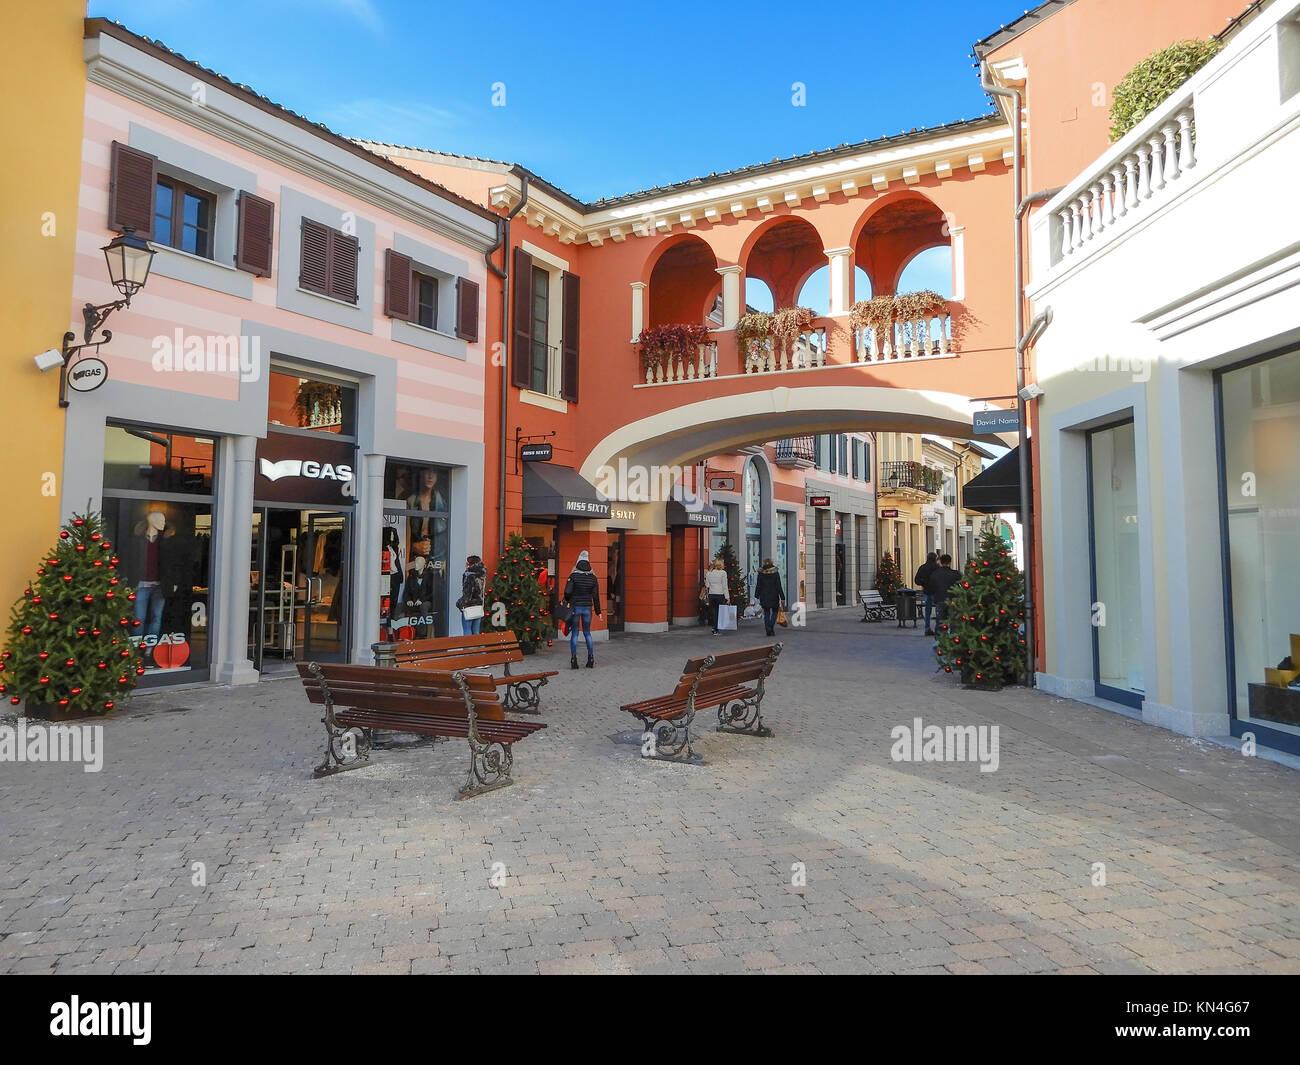 Alessandria italy stock photos alessandria italy stock for Milan outlet